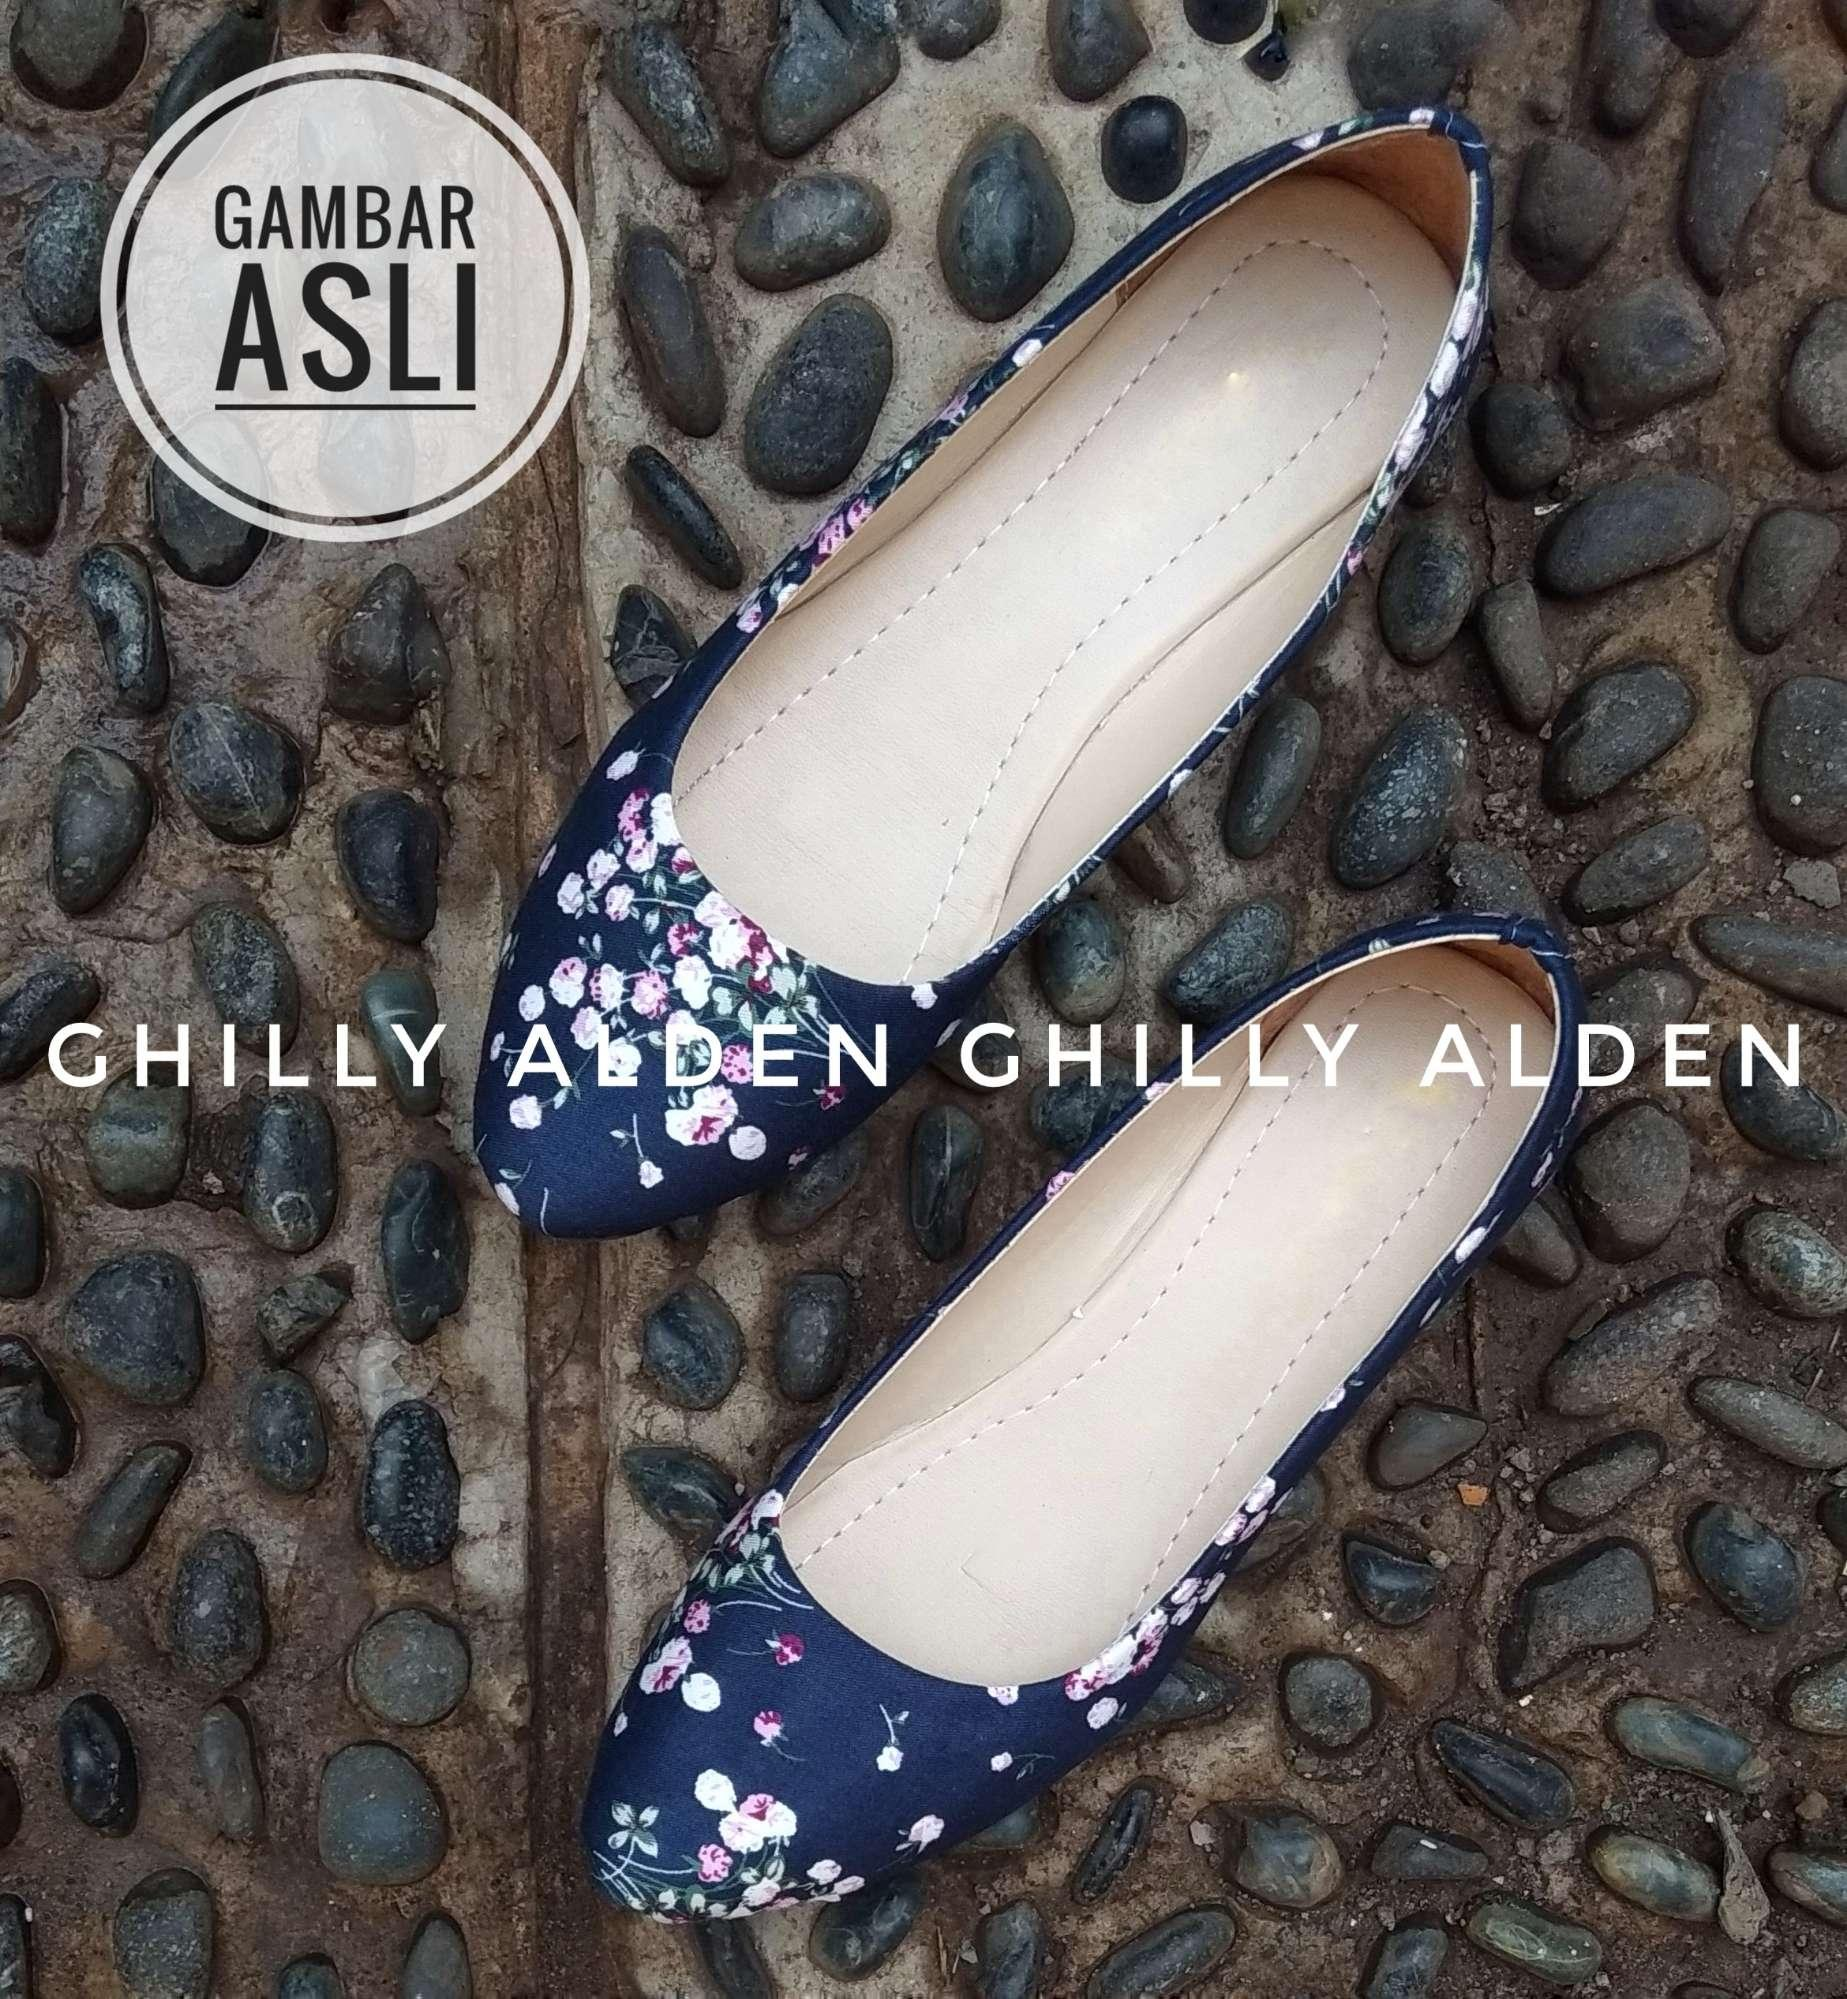 Ghilly Mikaila Mix Tas Selempang Tas Serut - Daftar Harga Terlengkap ... 2ba959f445